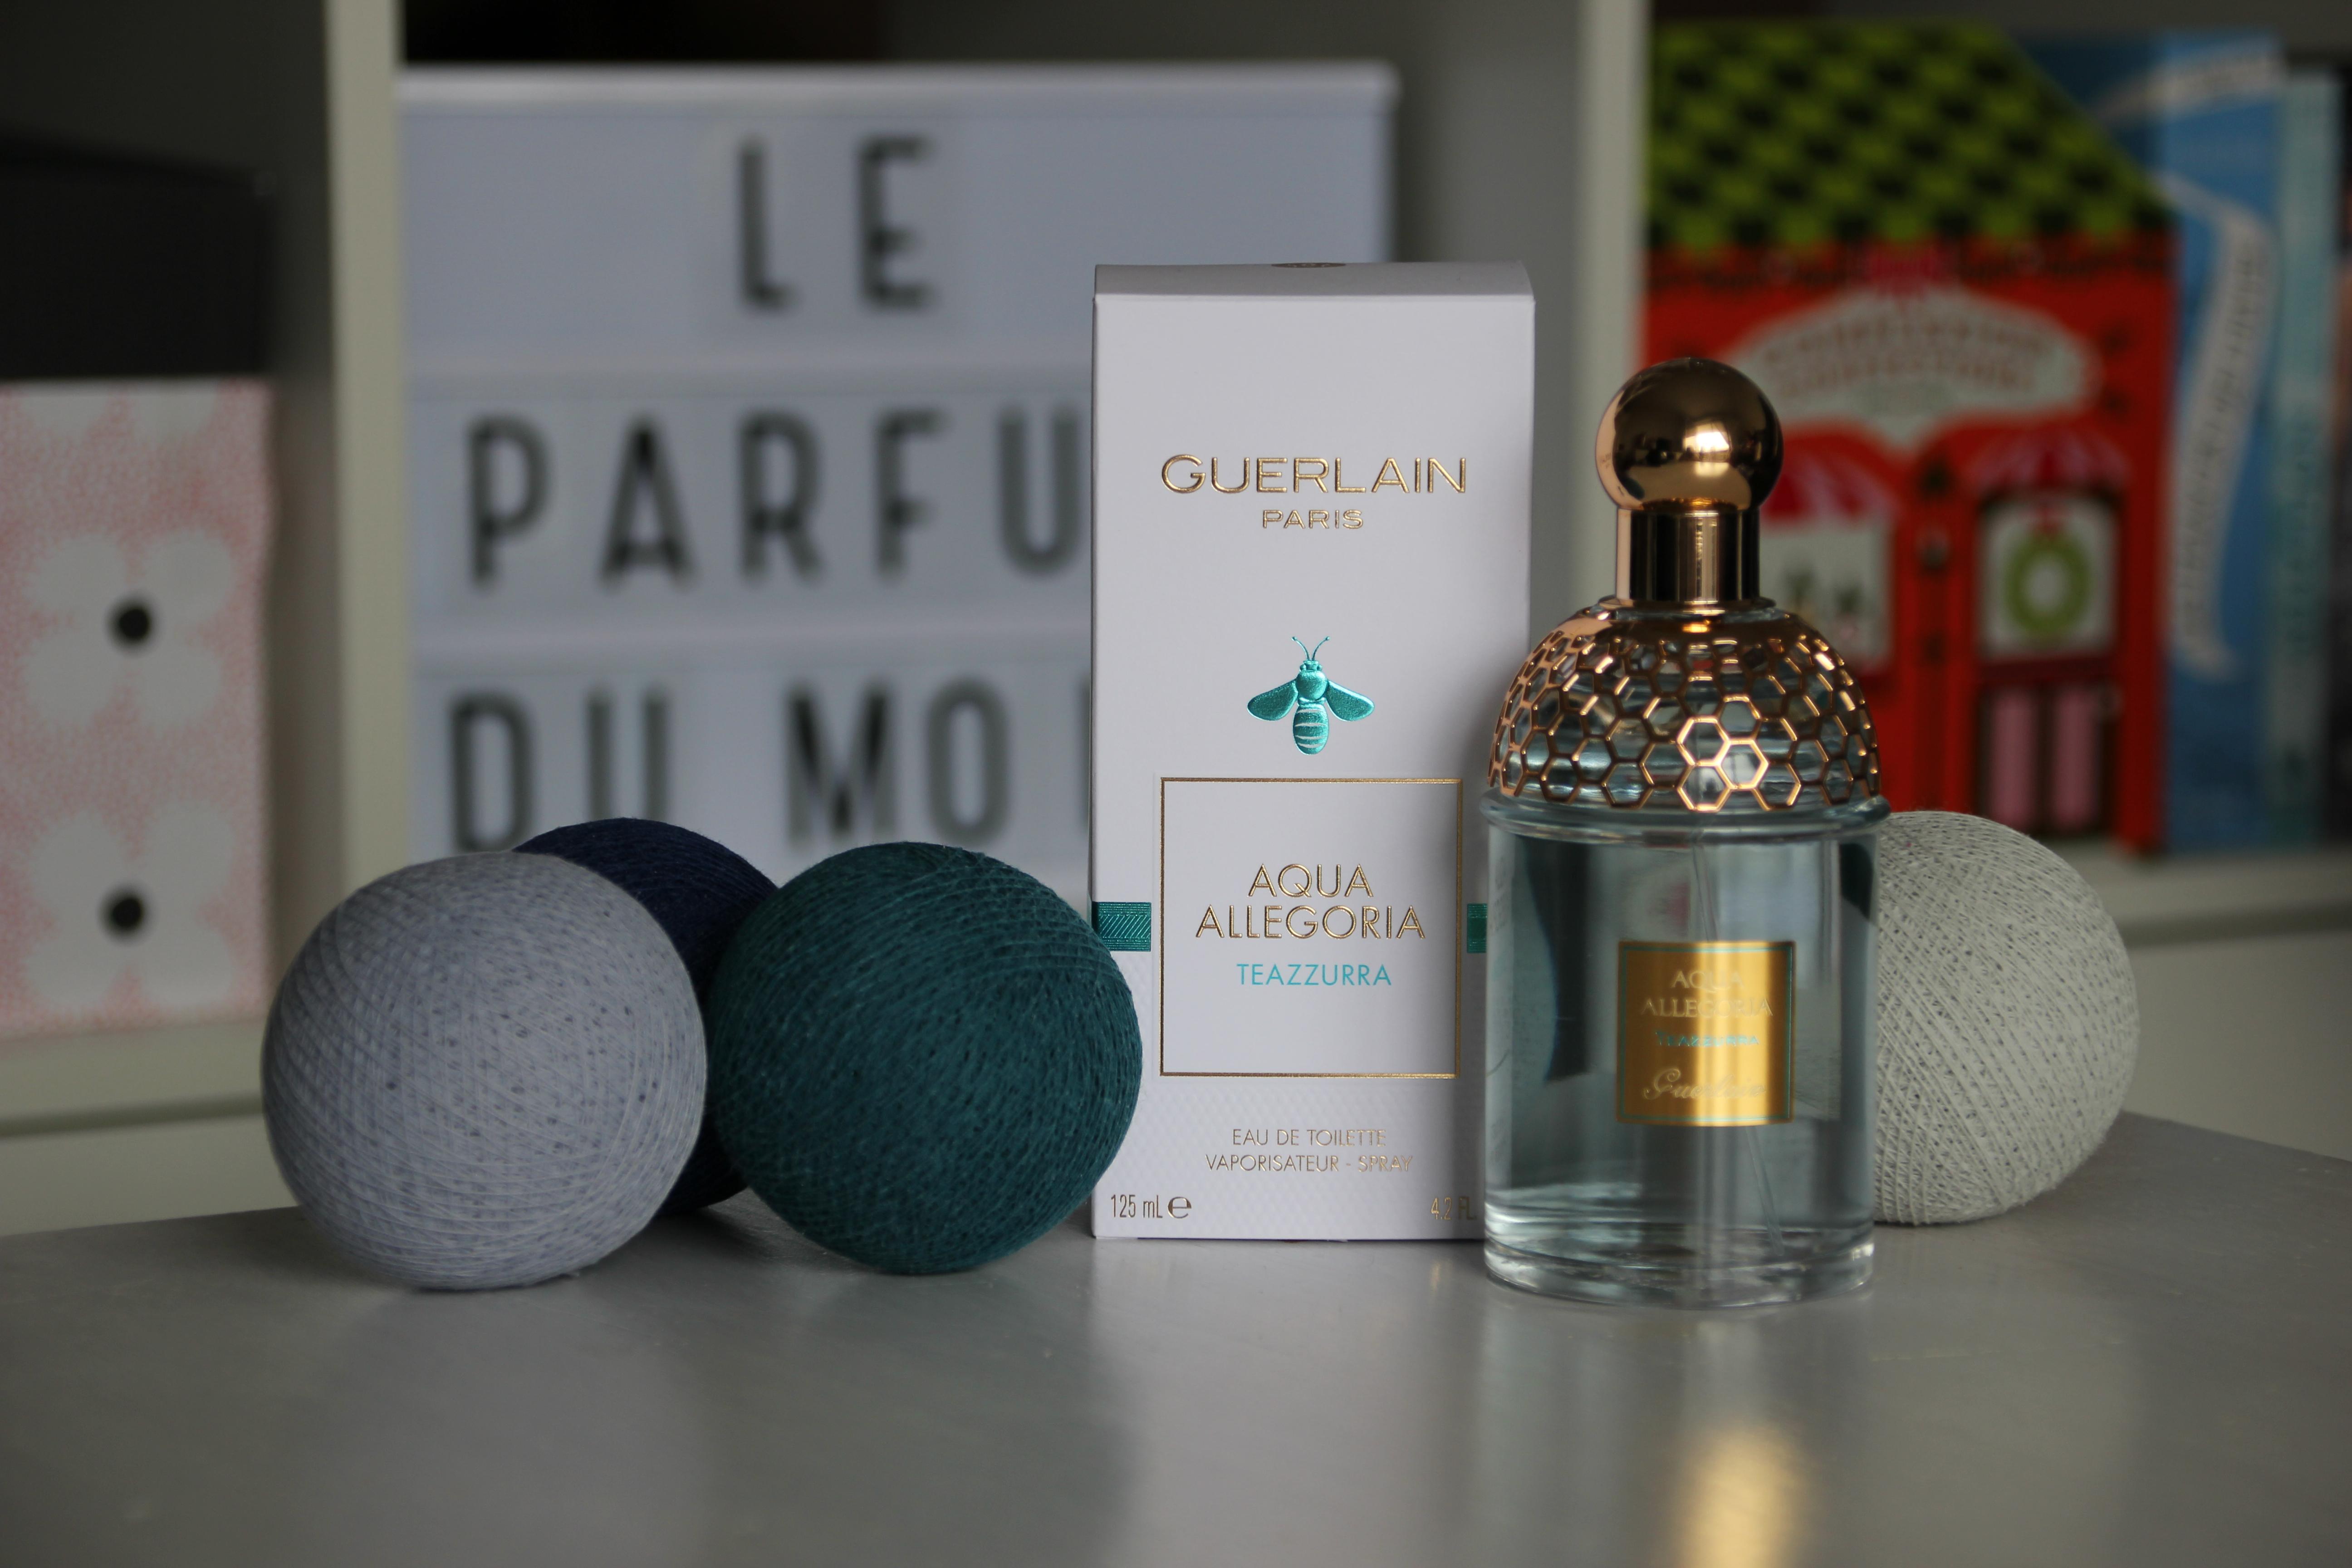 Jl54ar3 Du Guerlain Allegoriateazzurra Le Parfum De 3 Moisaqua Pvm8wO0Nyn